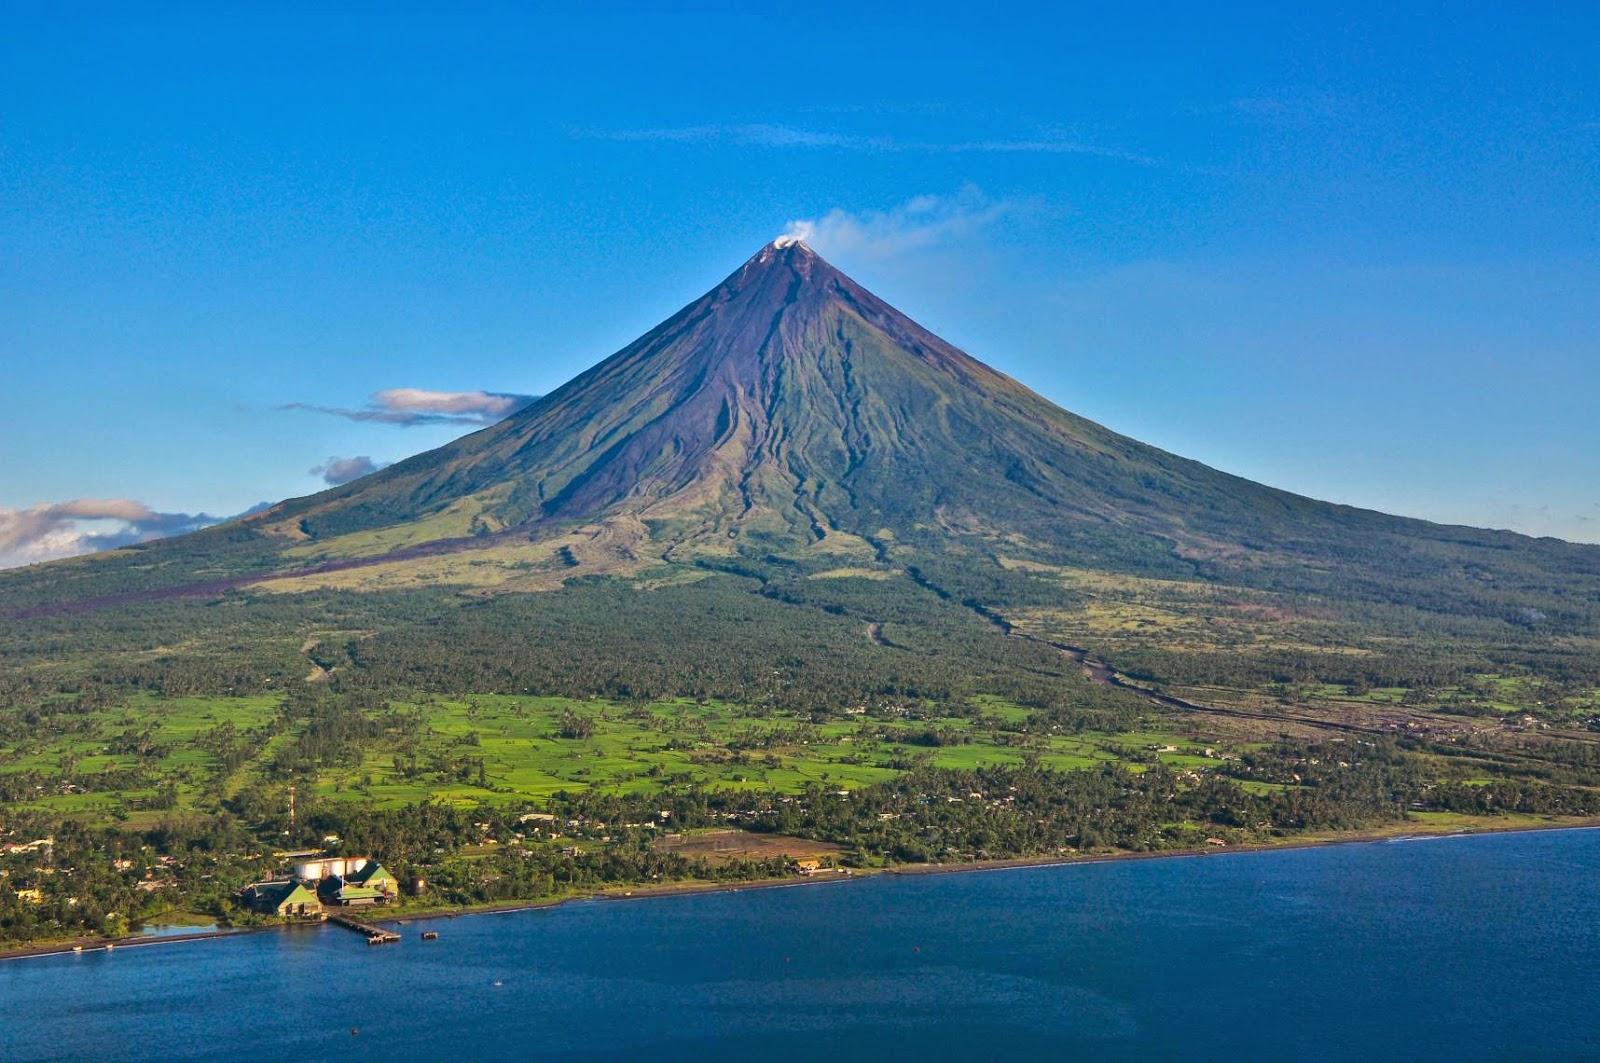 Santo Domingo (Albay) Philippines  city photos gallery : Paradise Beauty: Mt. Mayon, Albay, Philippines